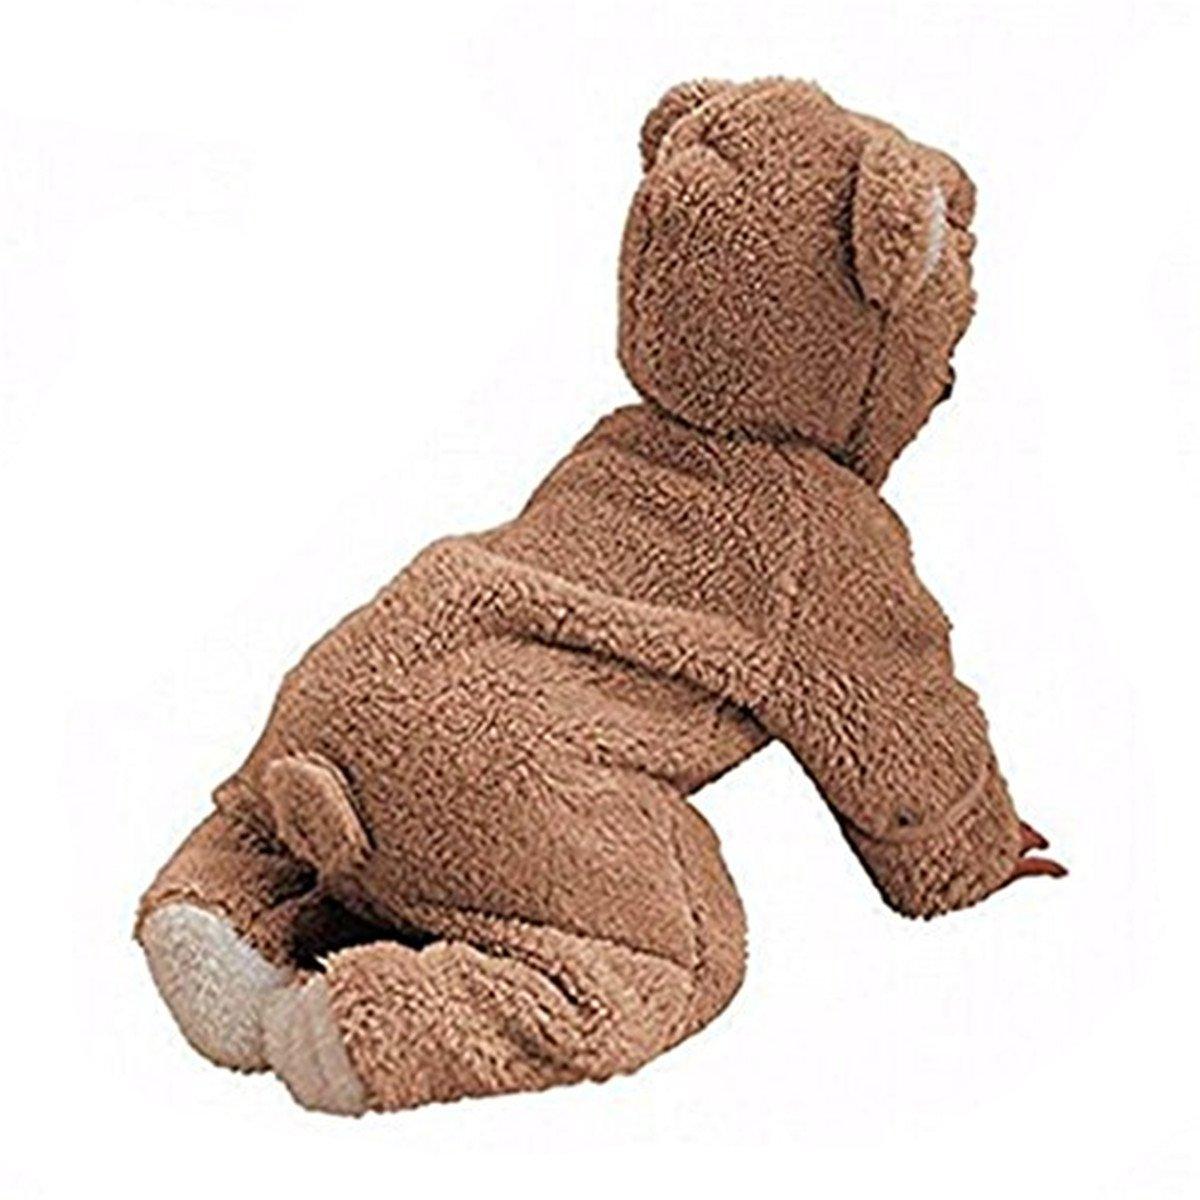 Ruiying Baby Unisex Winter Overalls mit Bär Stil Overall Kapuzen Jumpsuit Kapuzen Kleidung Herbst & Winter